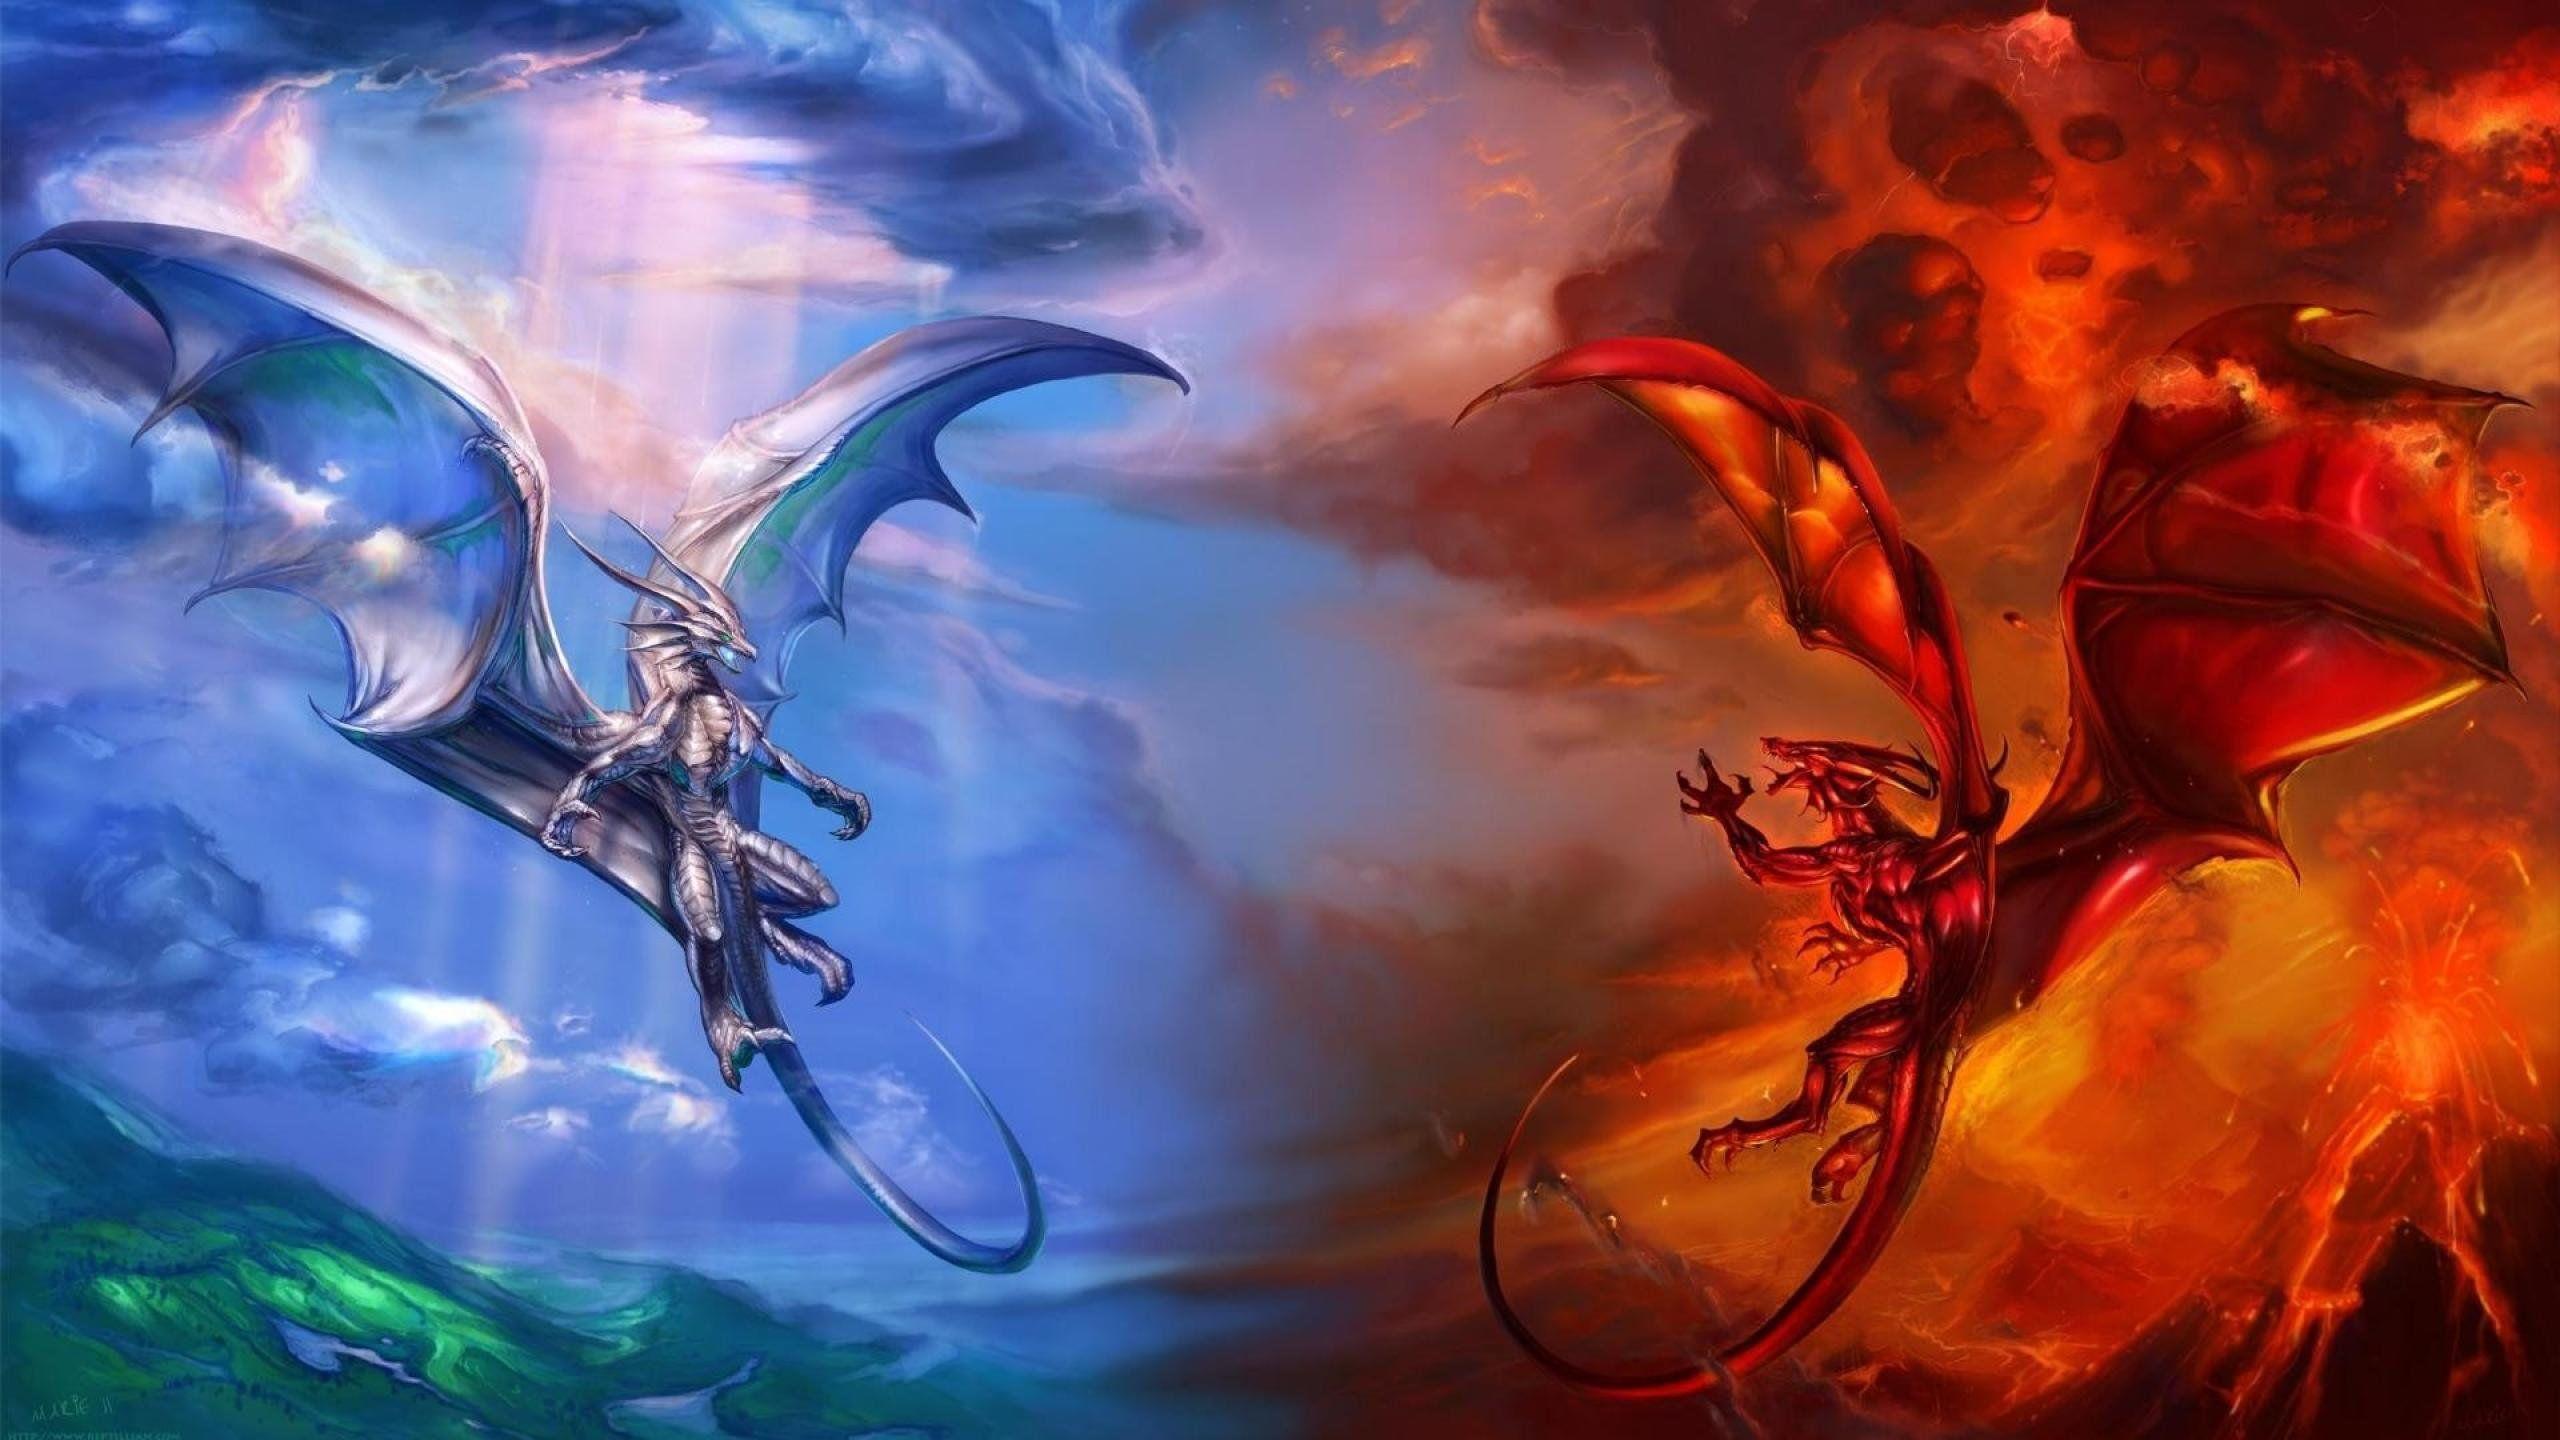 Red Fire Dragon Wallpaper